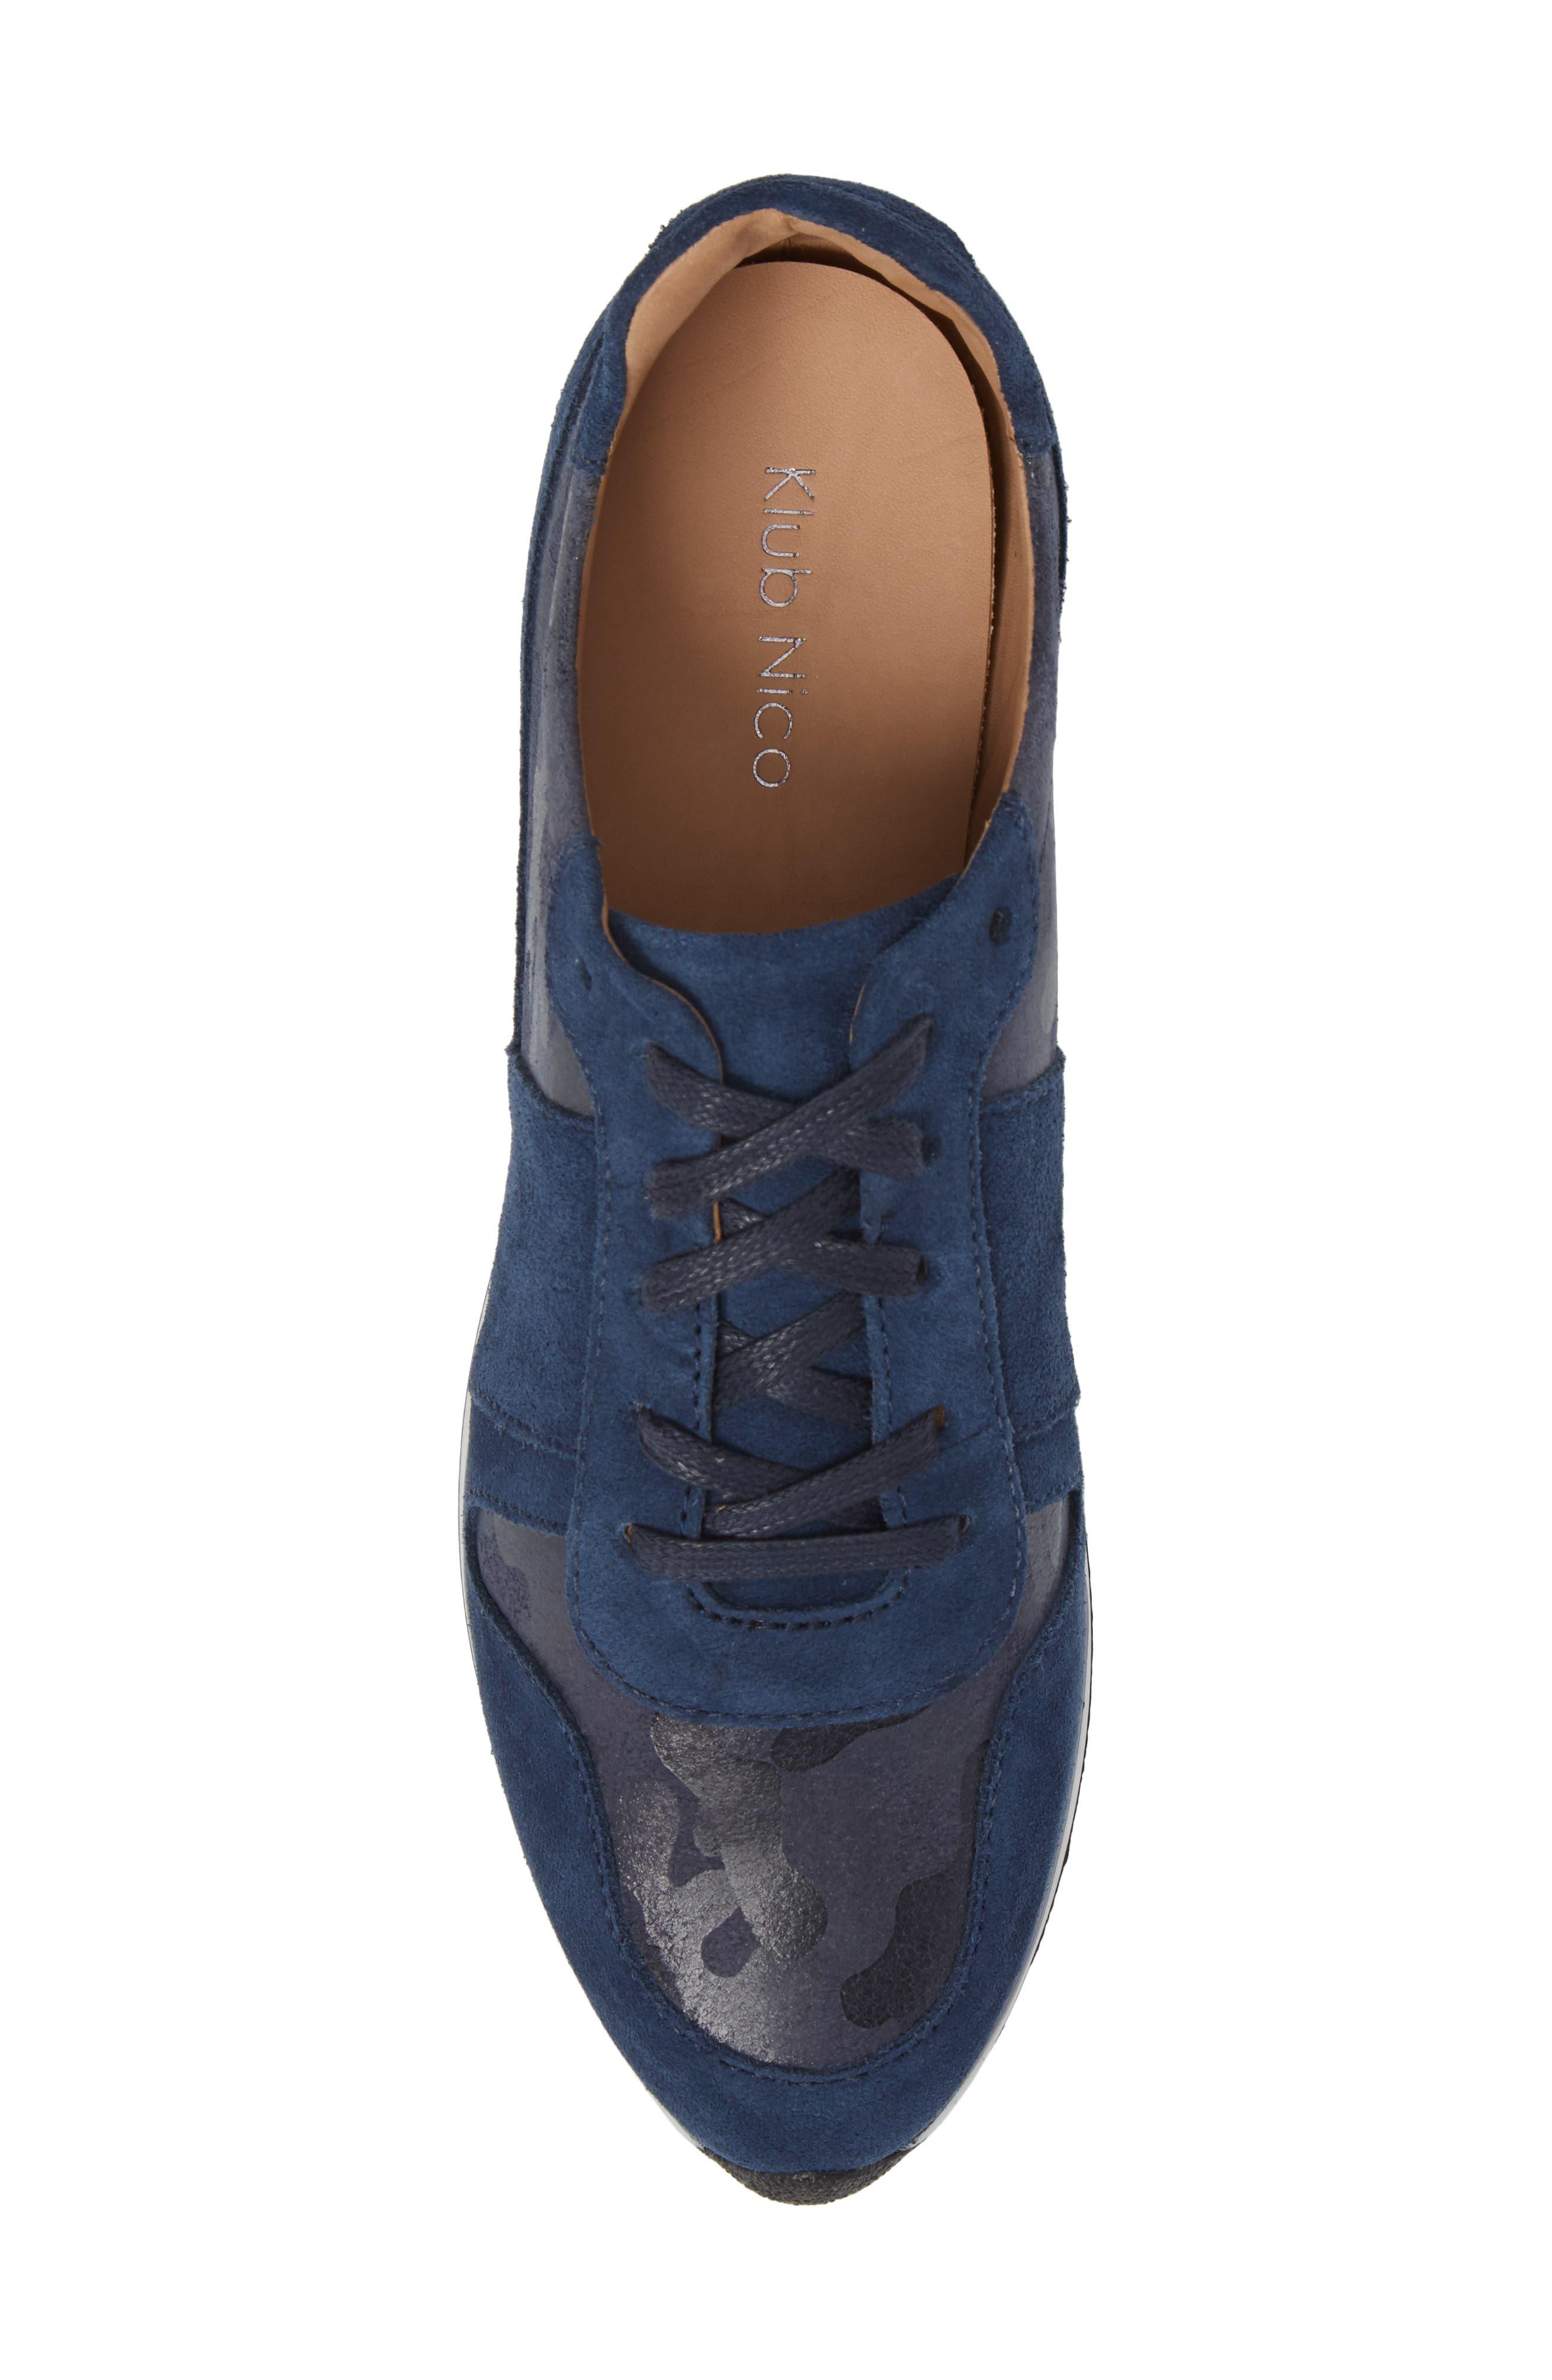 Stefani Sneaker,                             Alternate thumbnail 5, color,                             Camo Nubuck Leather